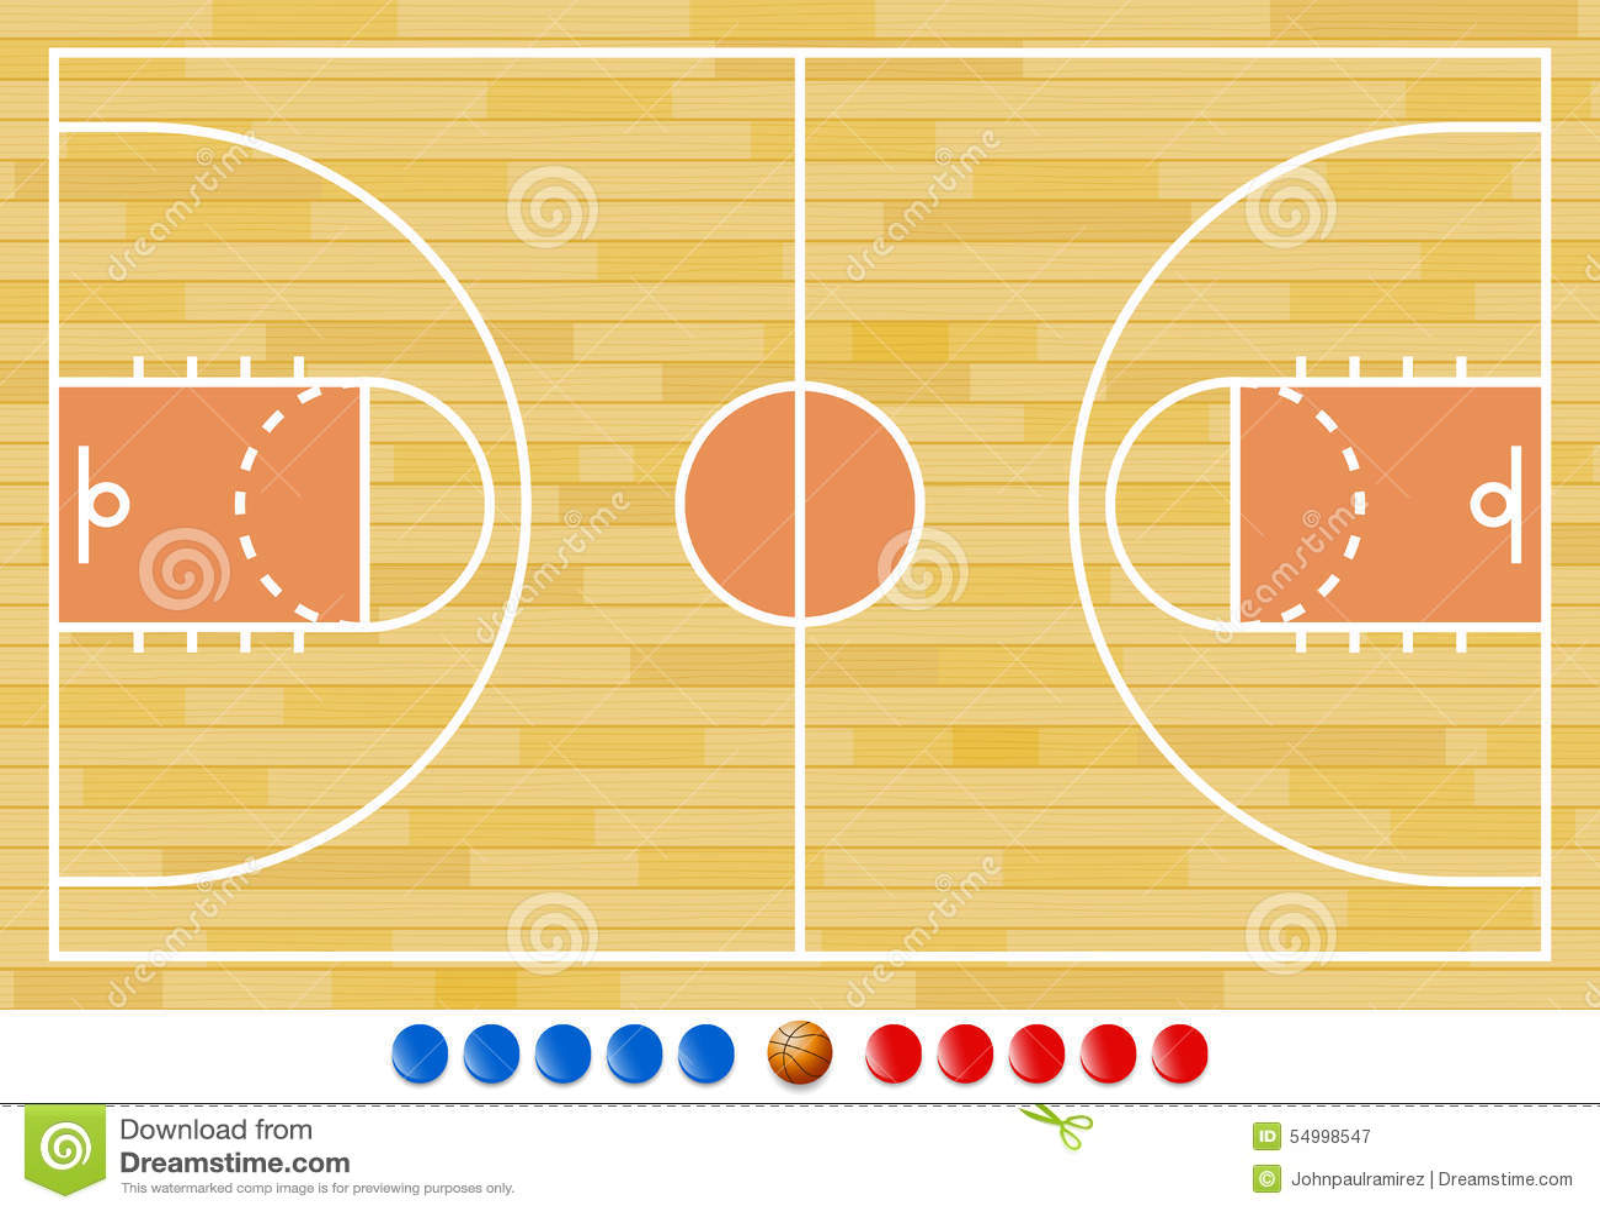 terrain de basket jeu de basket ball sport illustration de vecteur illustration du dessin. Black Bedroom Furniture Sets. Home Design Ideas